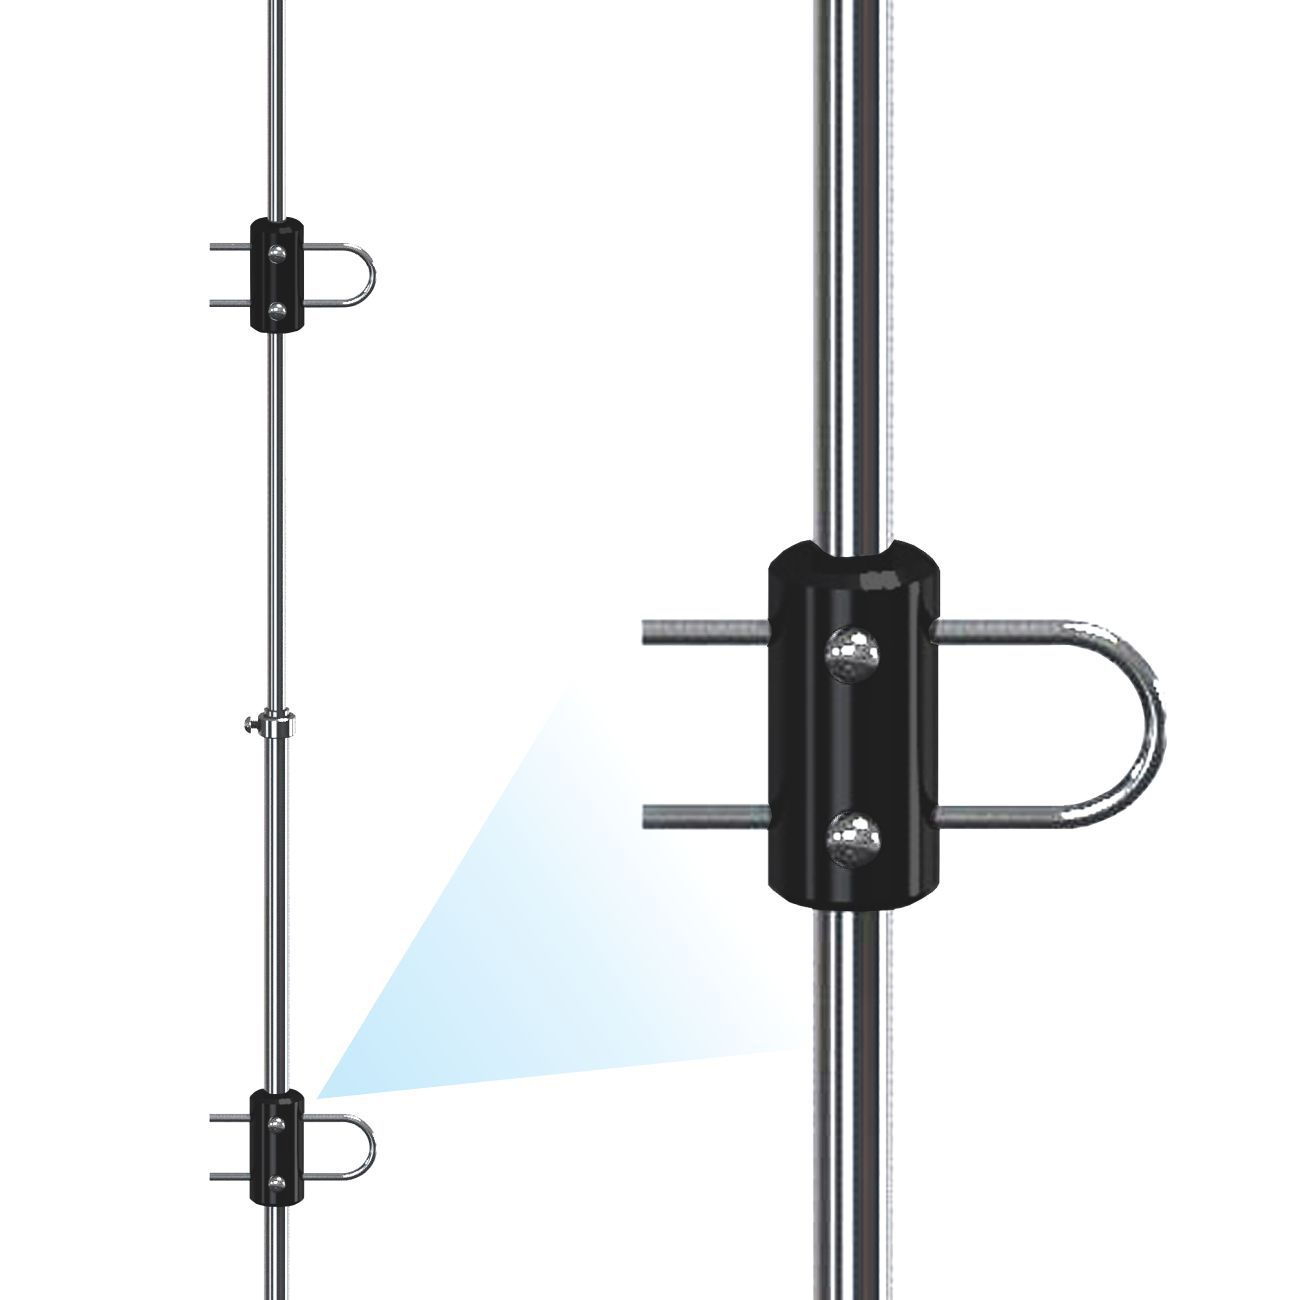 Antena Base UHF 3x 5/8 de Onda 9 dB Steelbras - AP8249